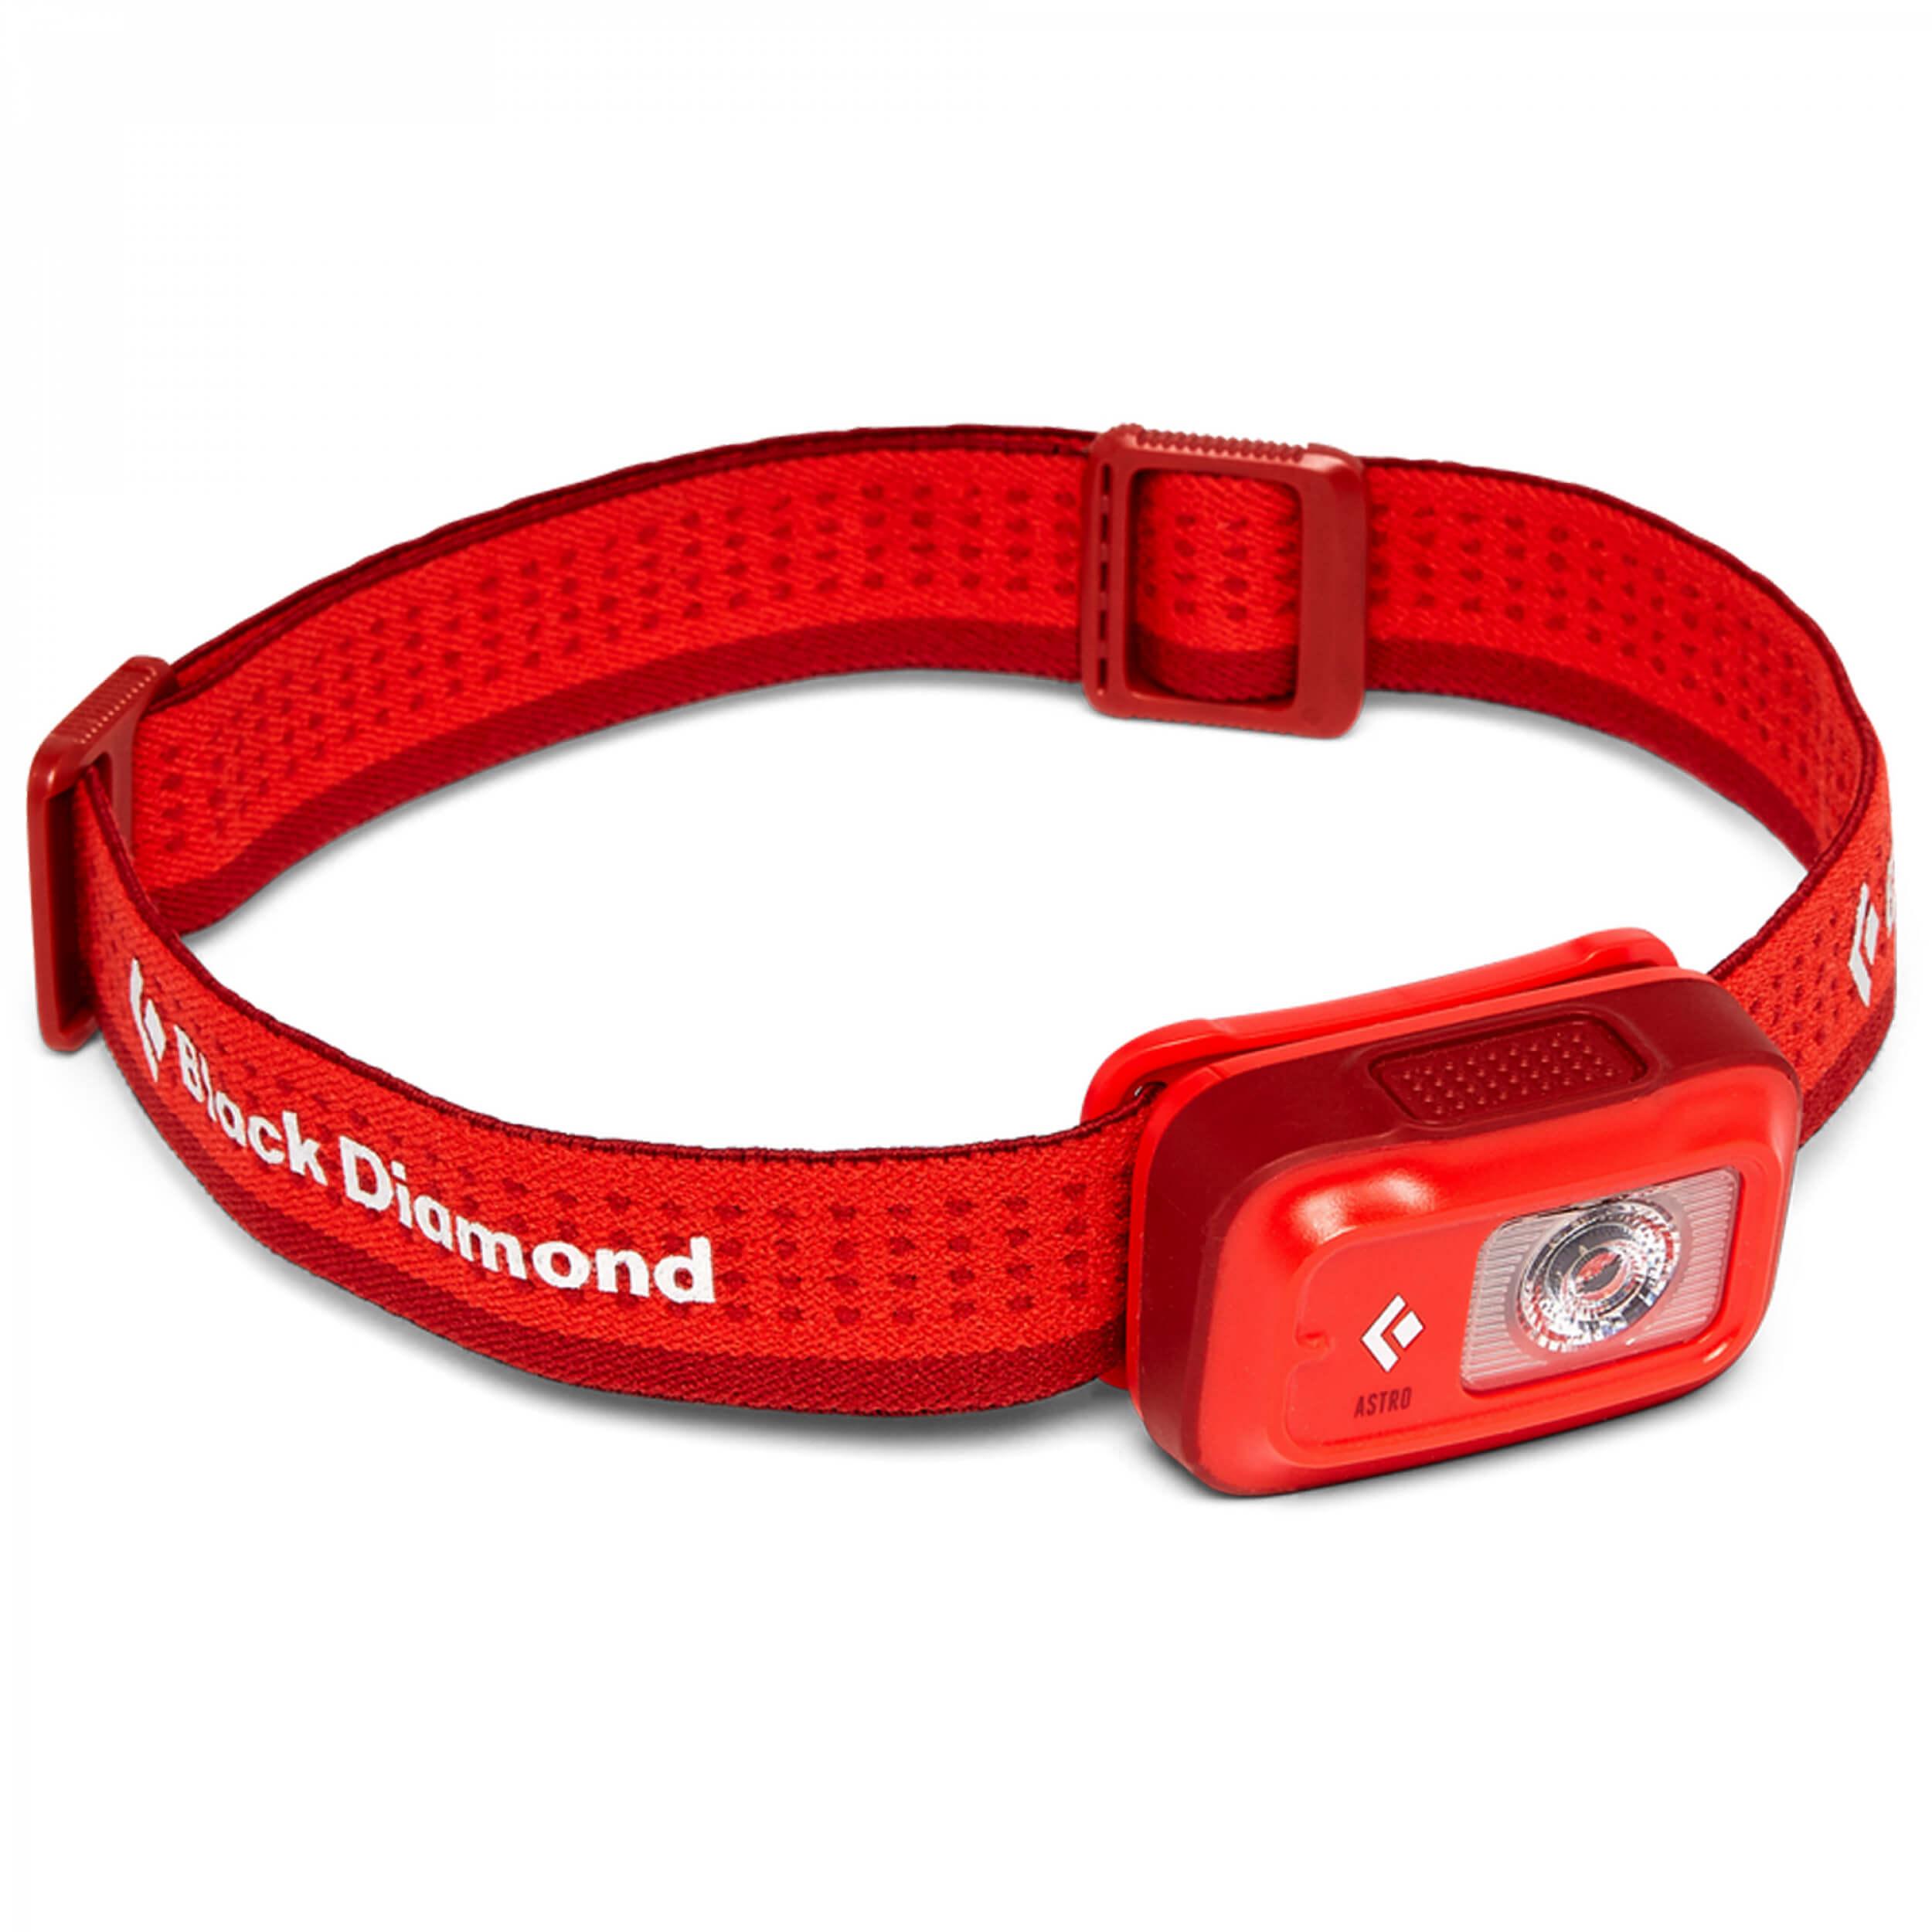 Black Diamond Astro 250 Headlamp octane